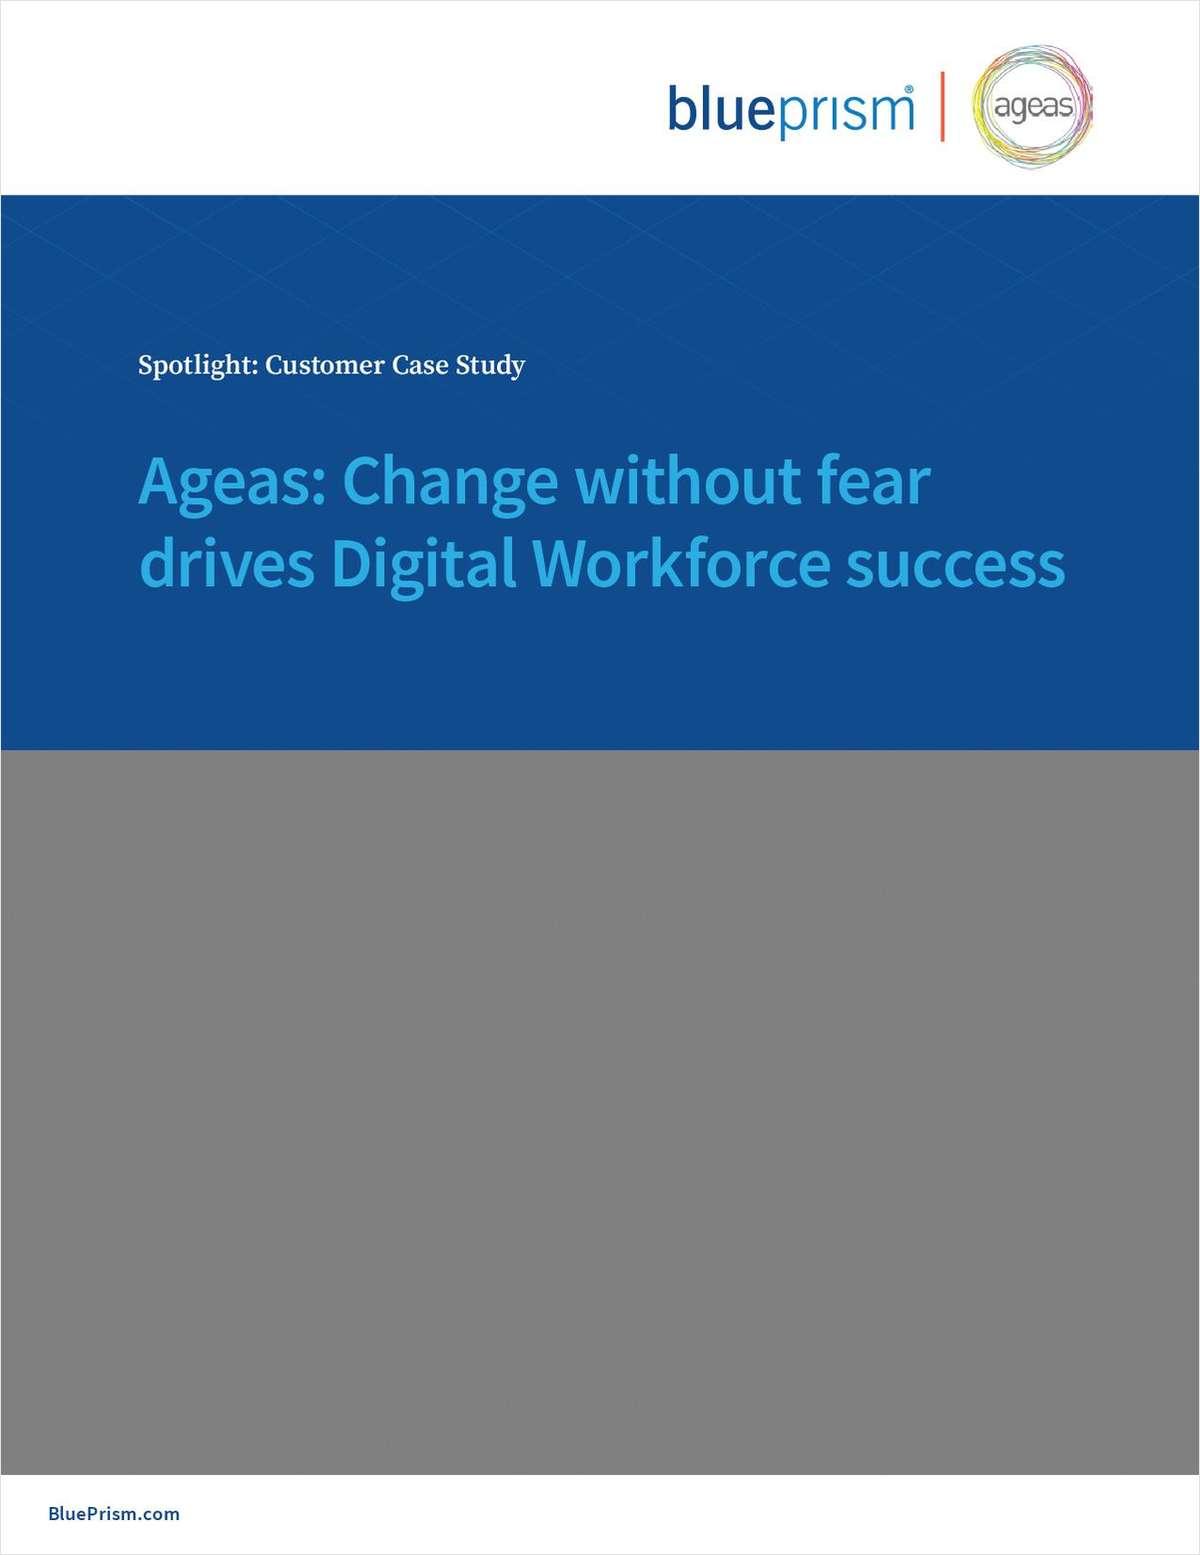 Ageas: Change without Fear Drives Digital Workforce Success